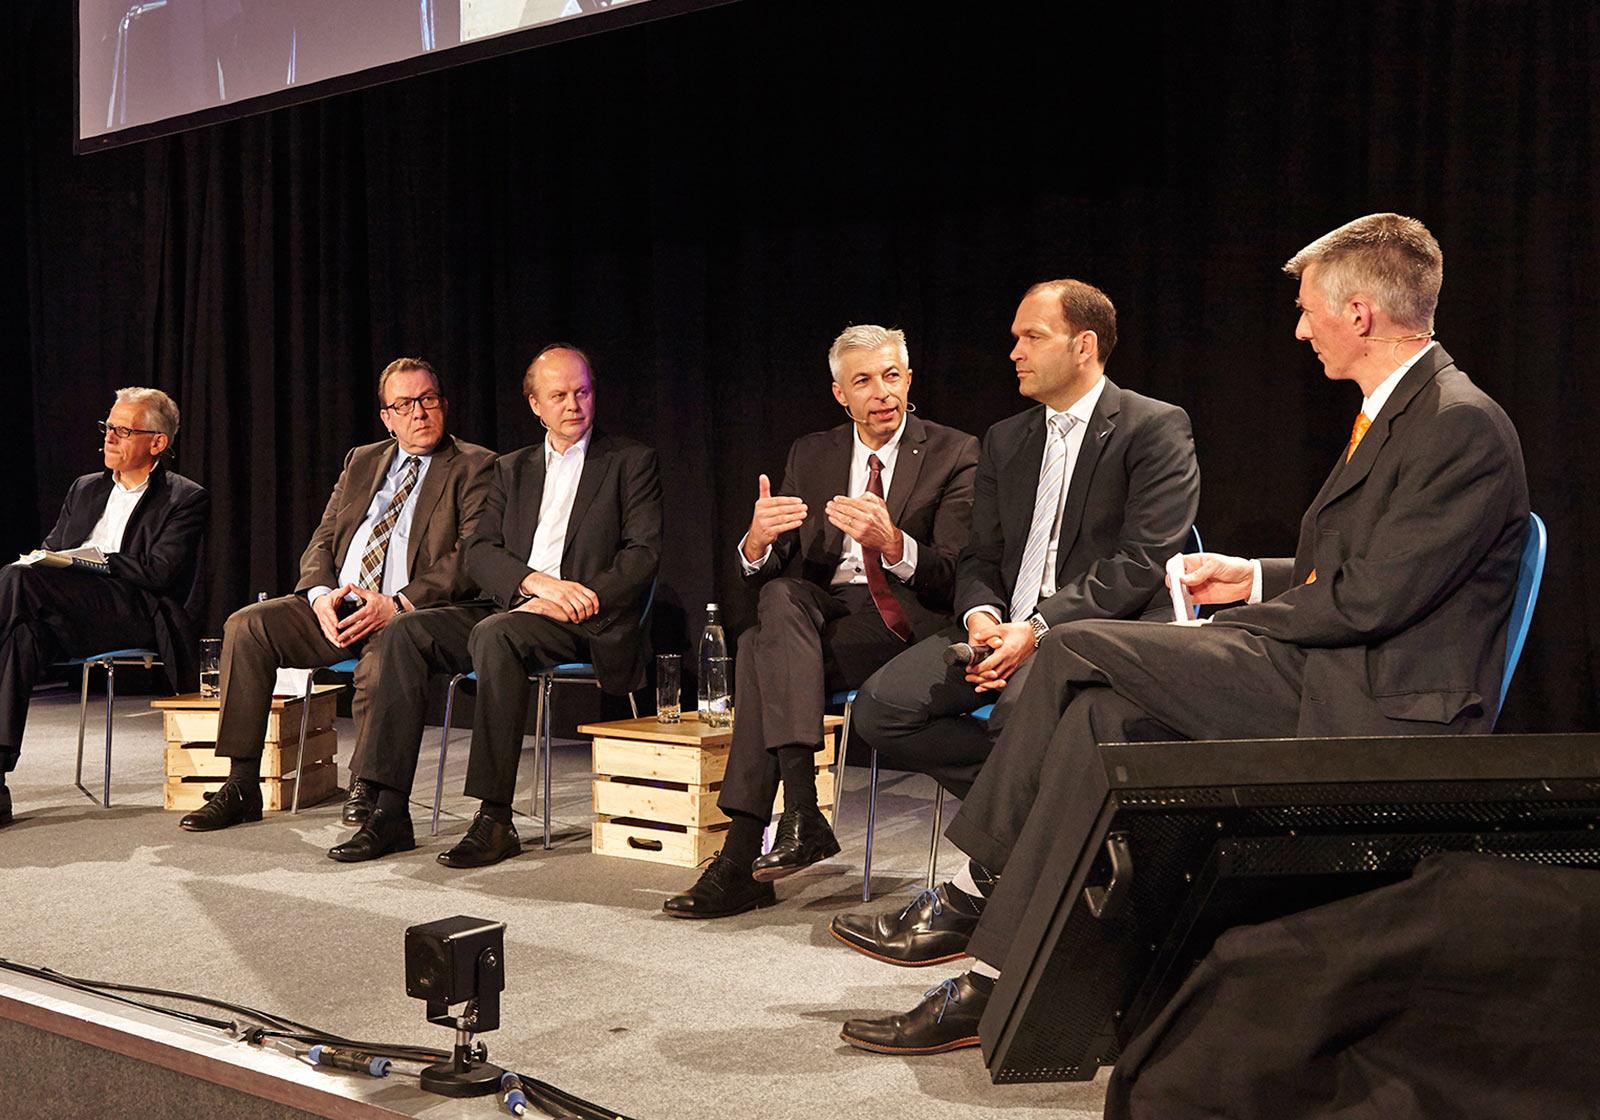 Участники дискуссии слева направо: Юрген Лаубер, Ахим Целлер, Альфред Шеленц, Герд Маурер, Гунтер Гамст, Кристоф Браунайс. Источник фото: DAIKIN